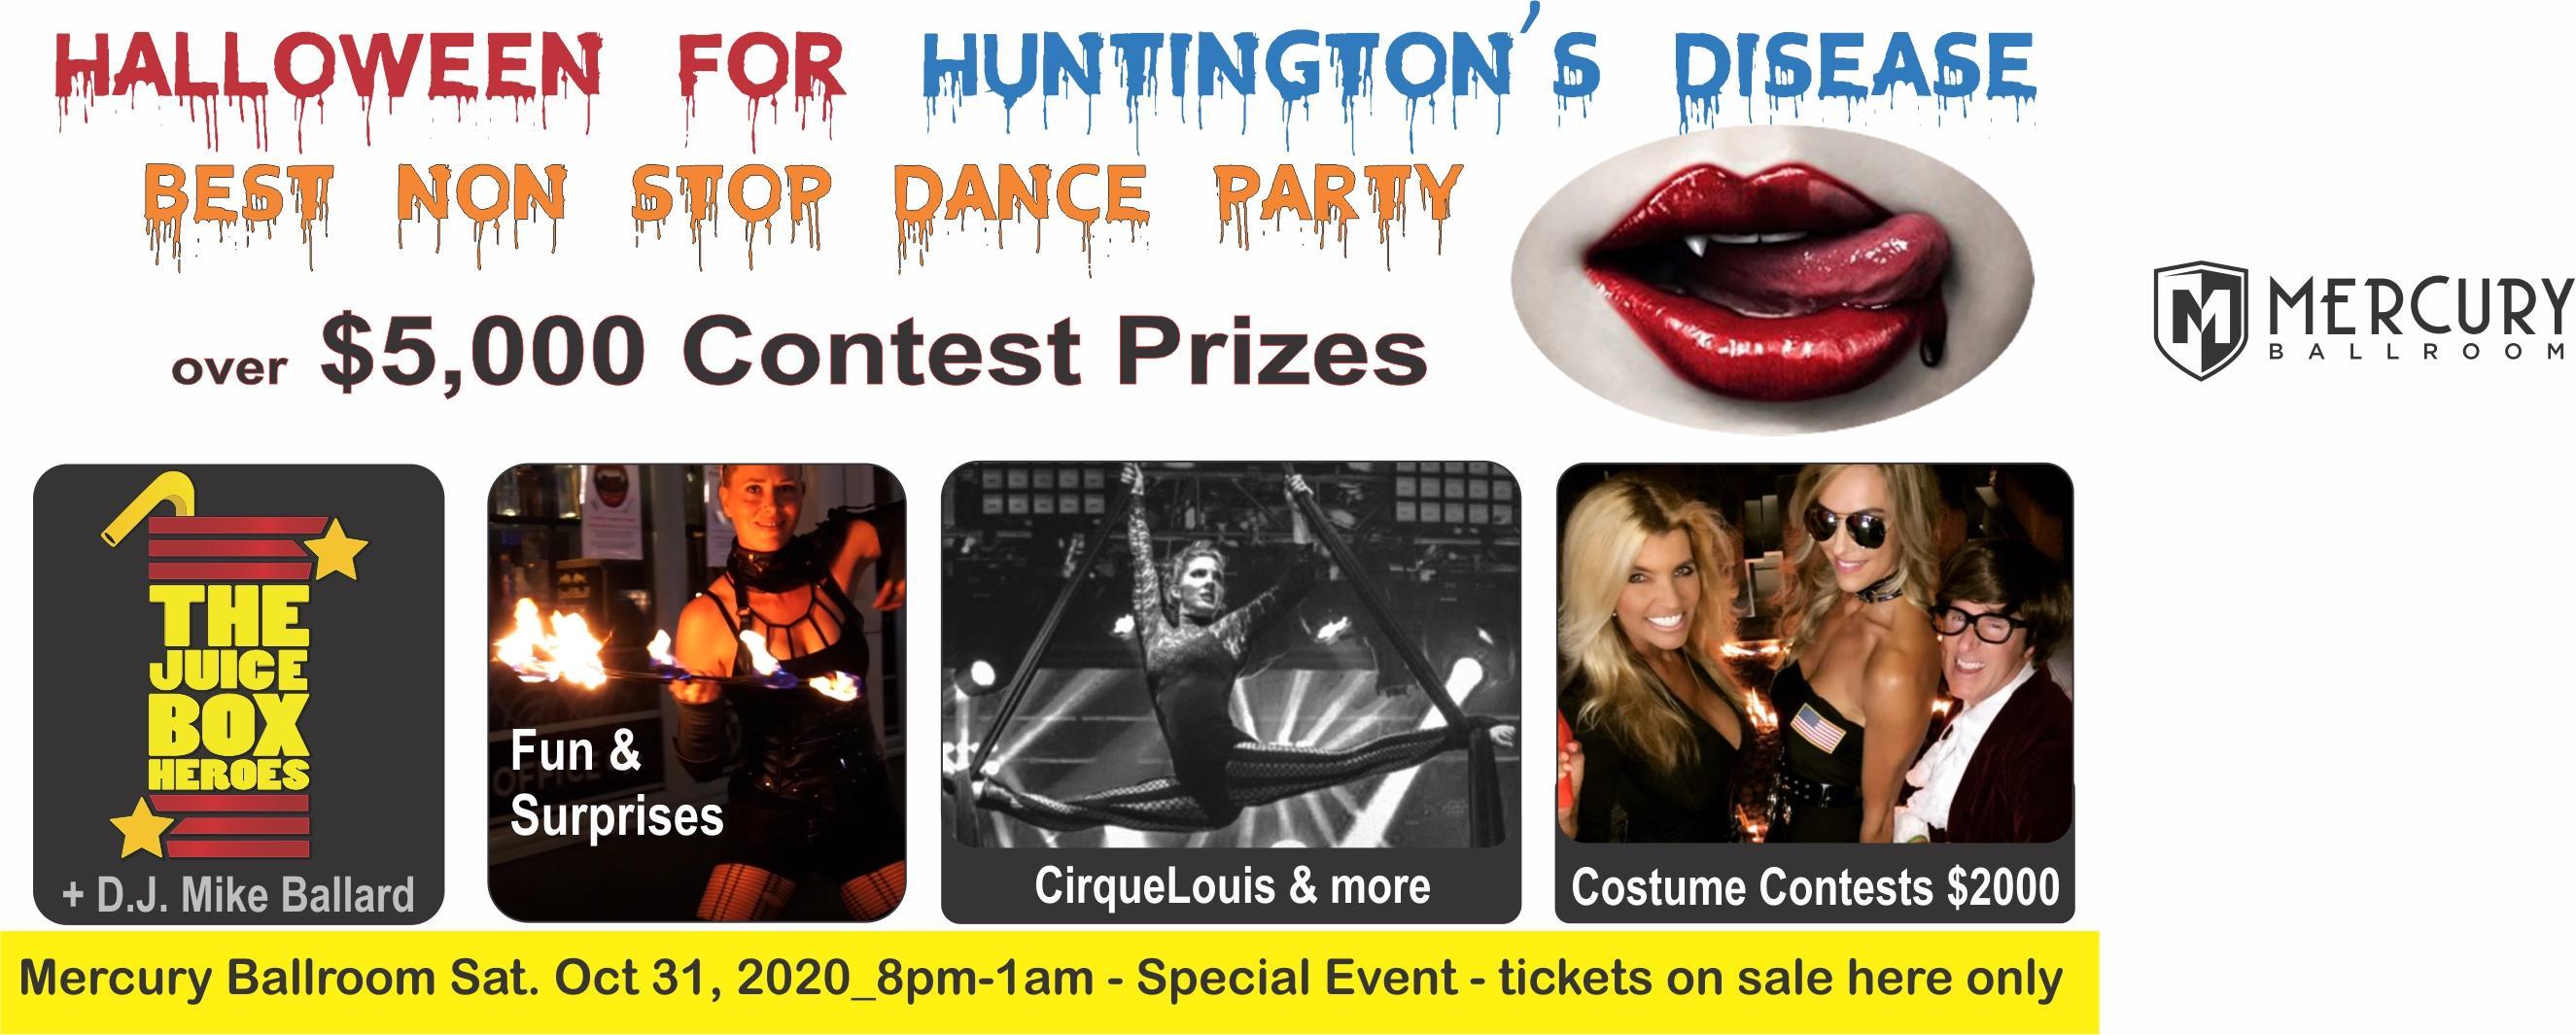 Halloween Dance Party 2020 Halloween for Huntington's Disease   Mercury Ballroom Dance Party